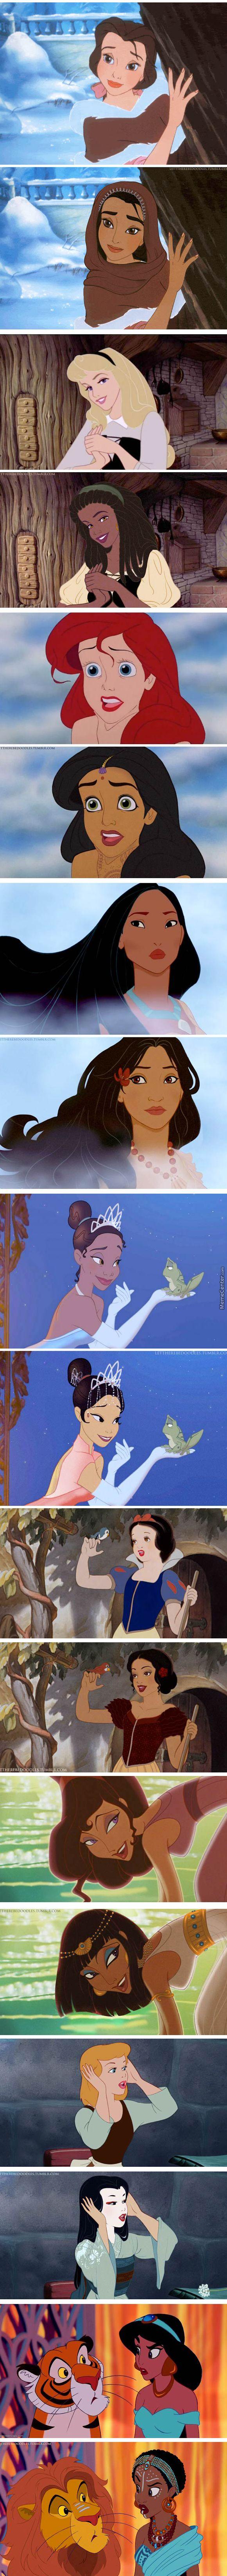 38 best Princess images on Pinterest